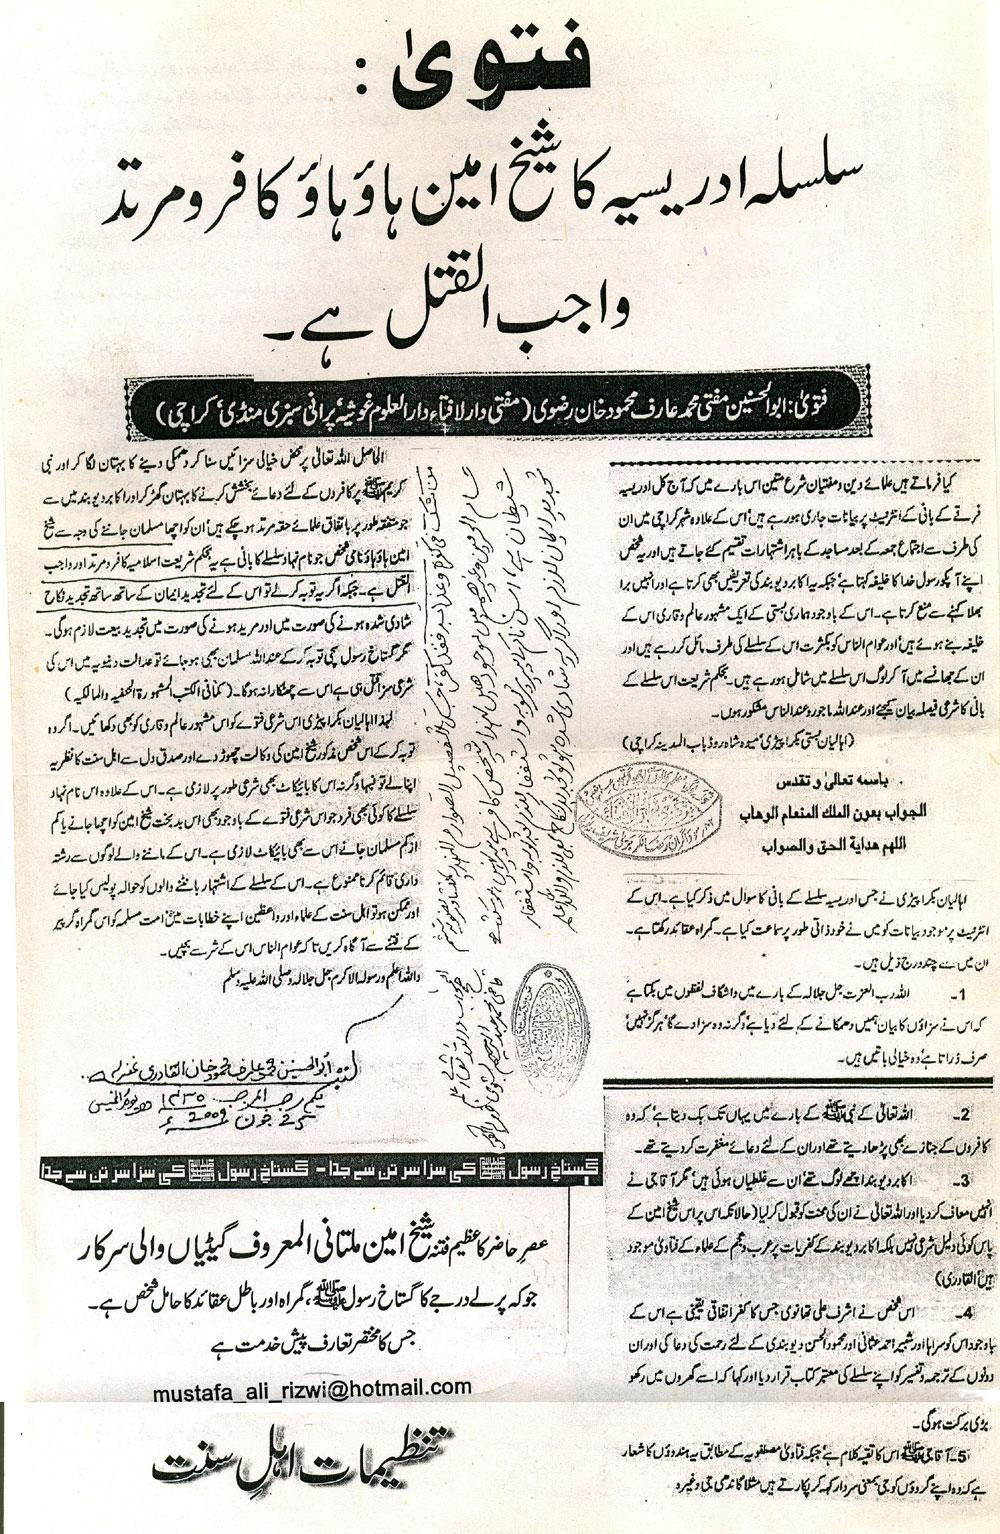 Fatwa-Karachi-1-Ameen.jpg